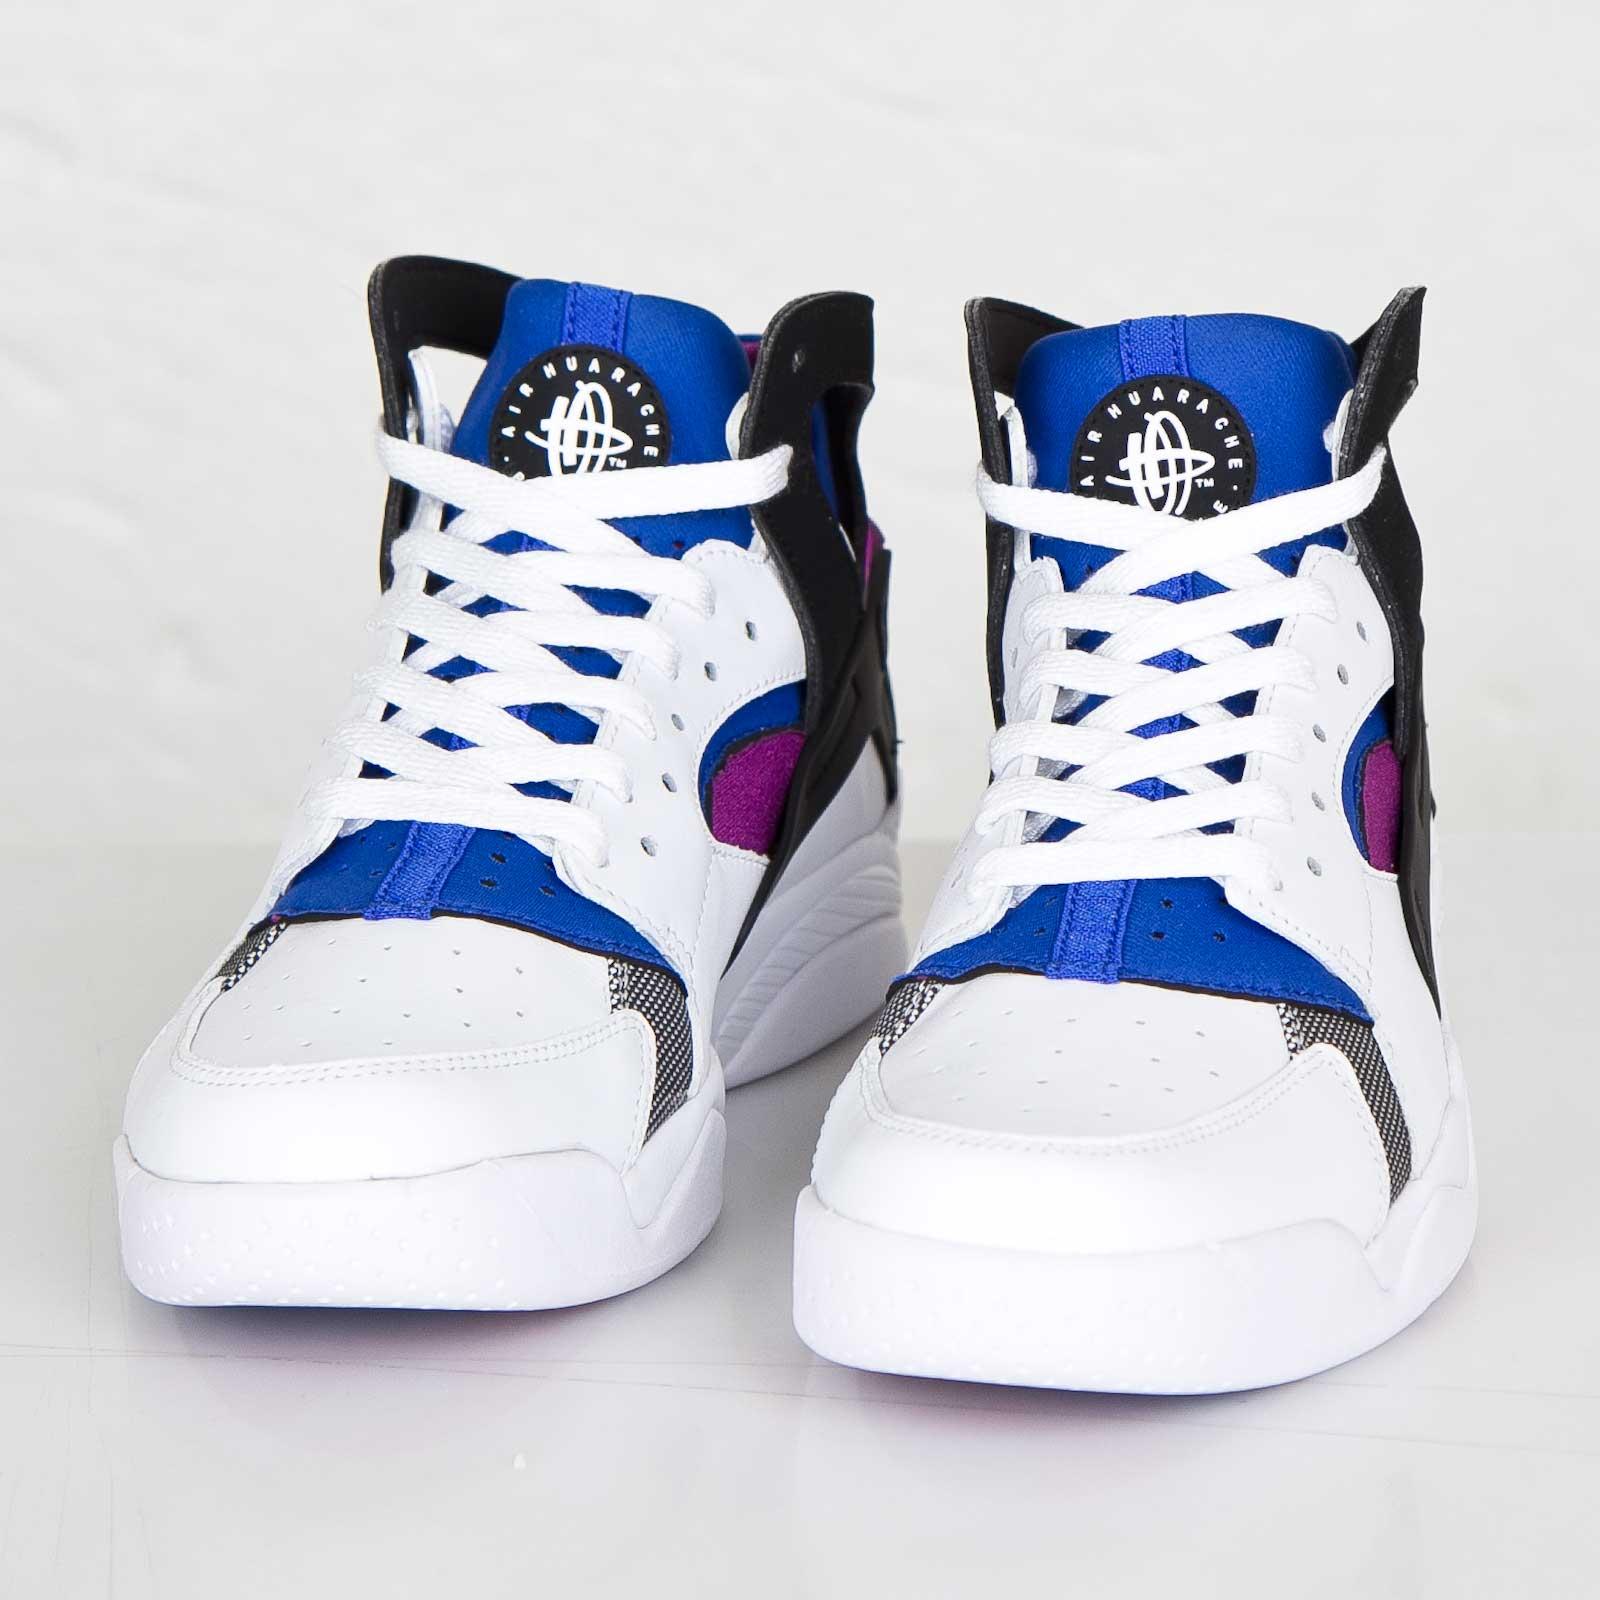 official photos 828cf df886 Nike Air Flight Huarache Prm QS - 686203-100 - Sneakersnstuff | sneakers &  streetwear online since 1999